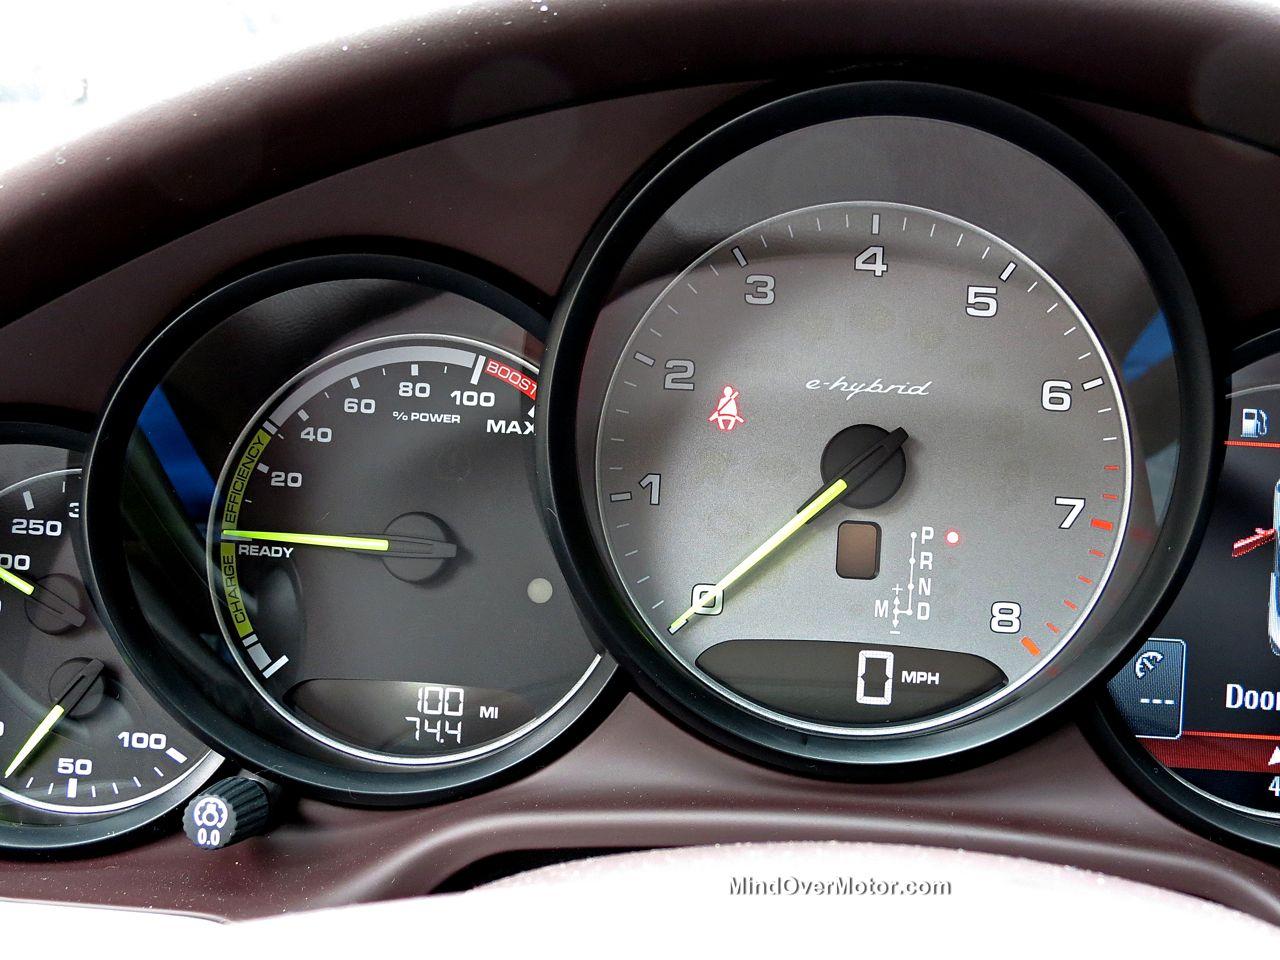 Porsche Panamera S E-Hybrid Gauges